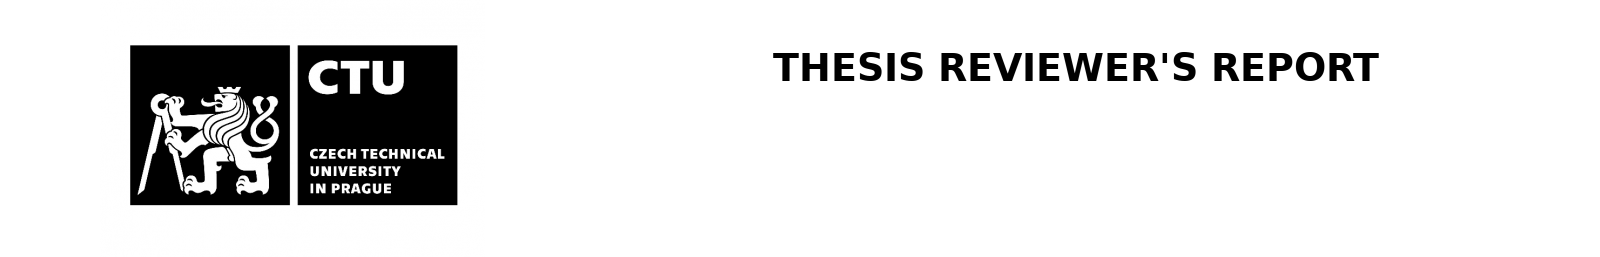 logo-reviewer-en.png